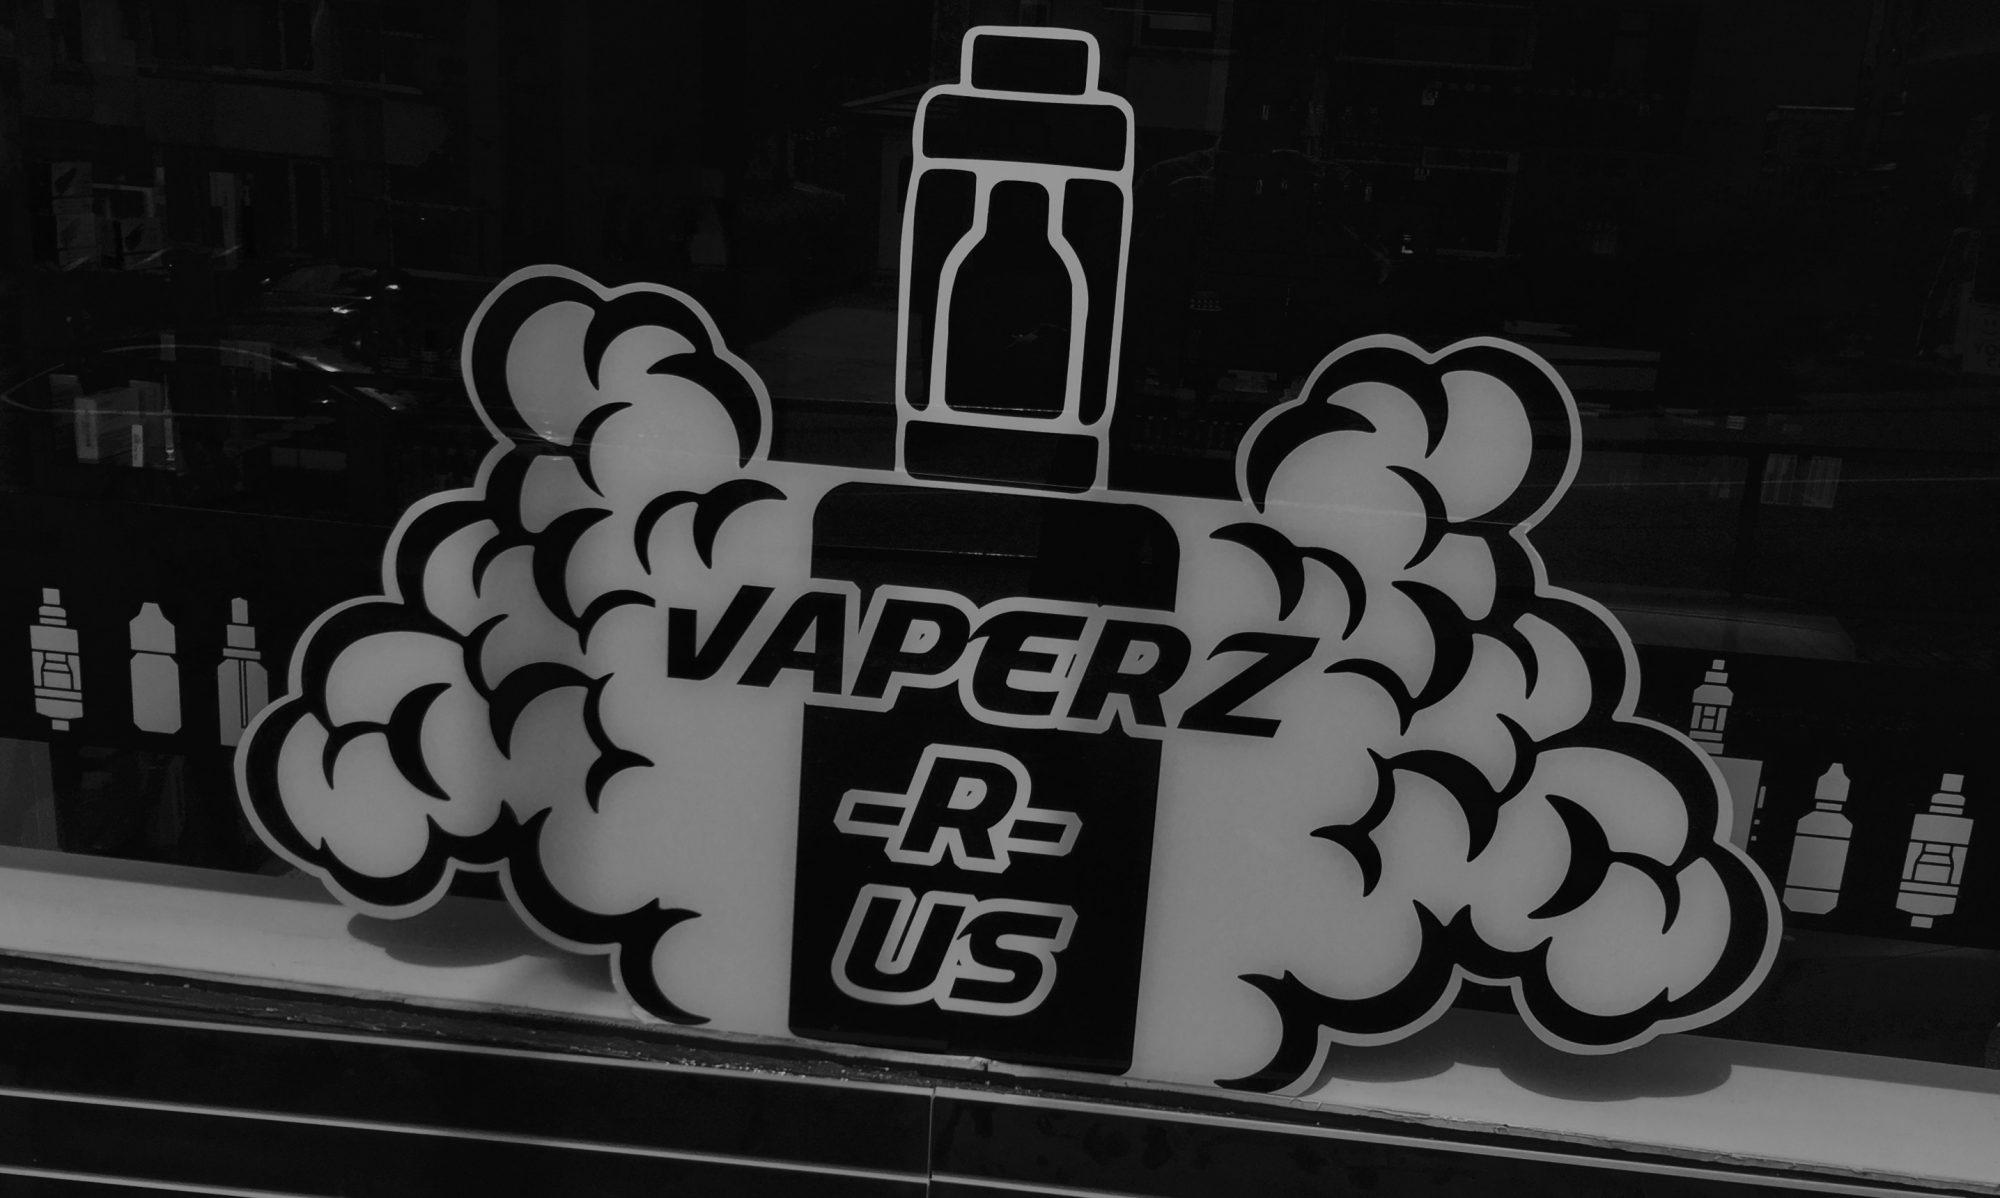 Vaperz-R-Us